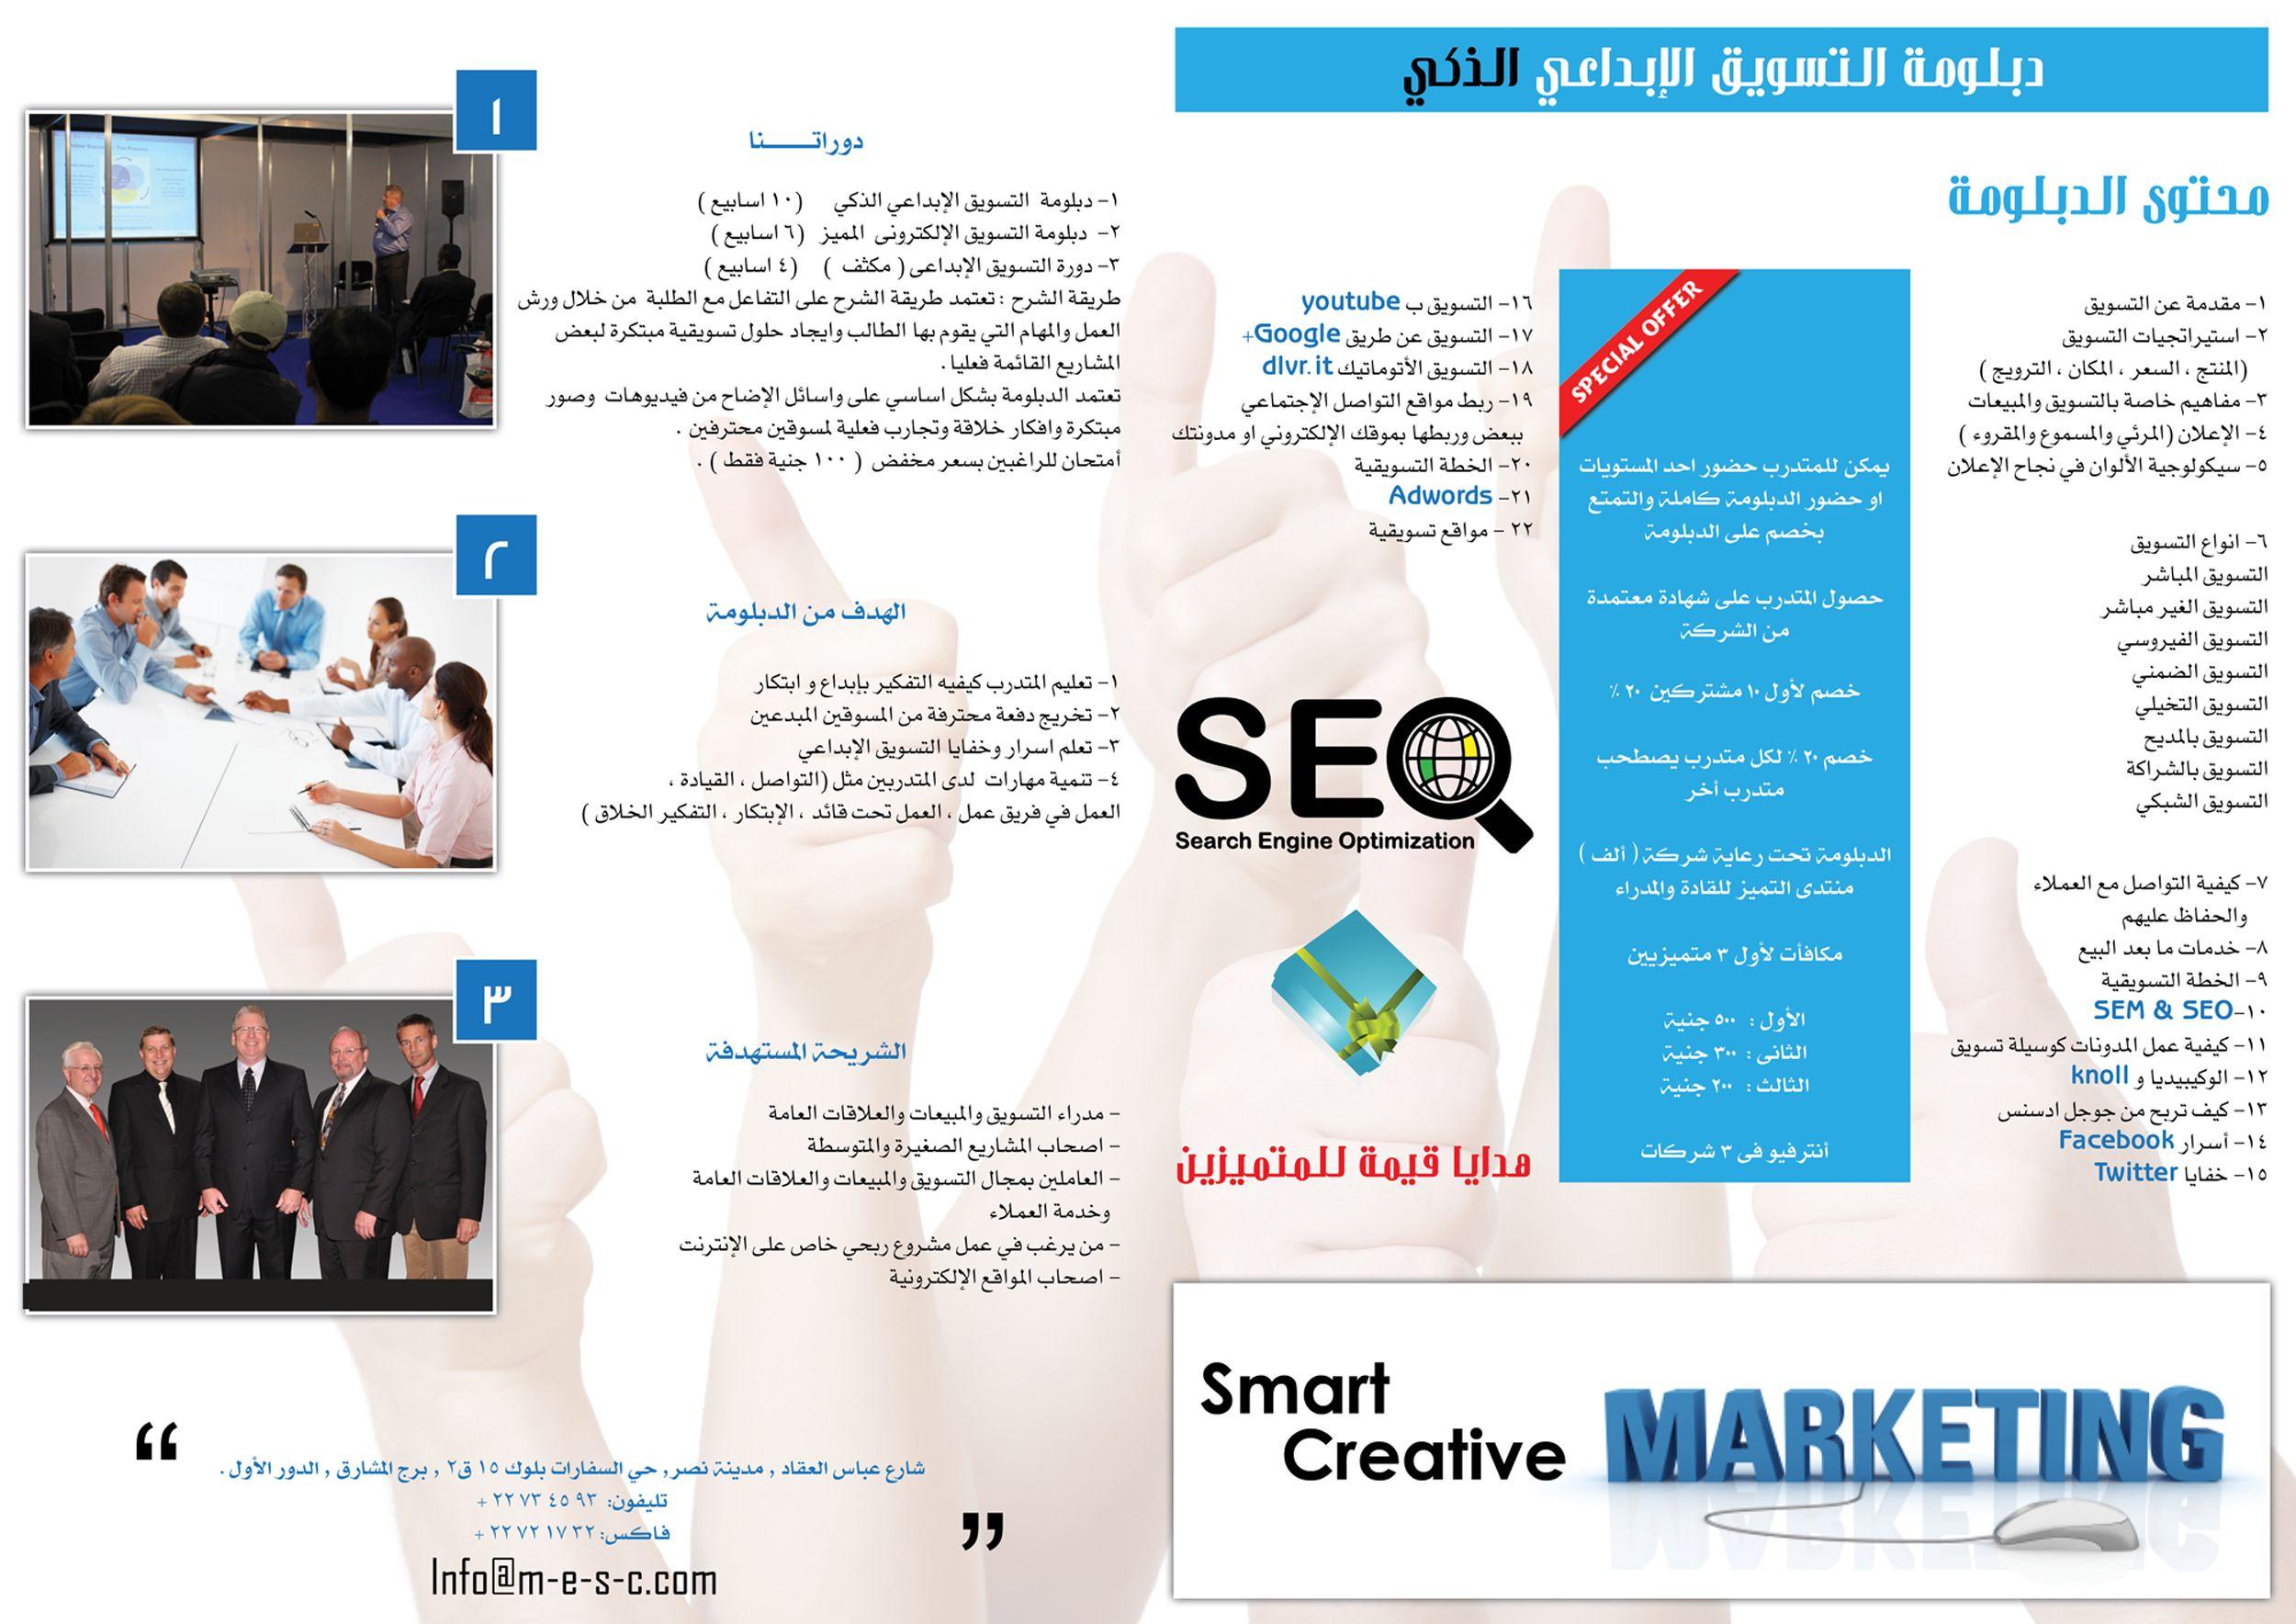 Designs Design Http M E S C Com En Optimization Search Engine Optimization Search Engine